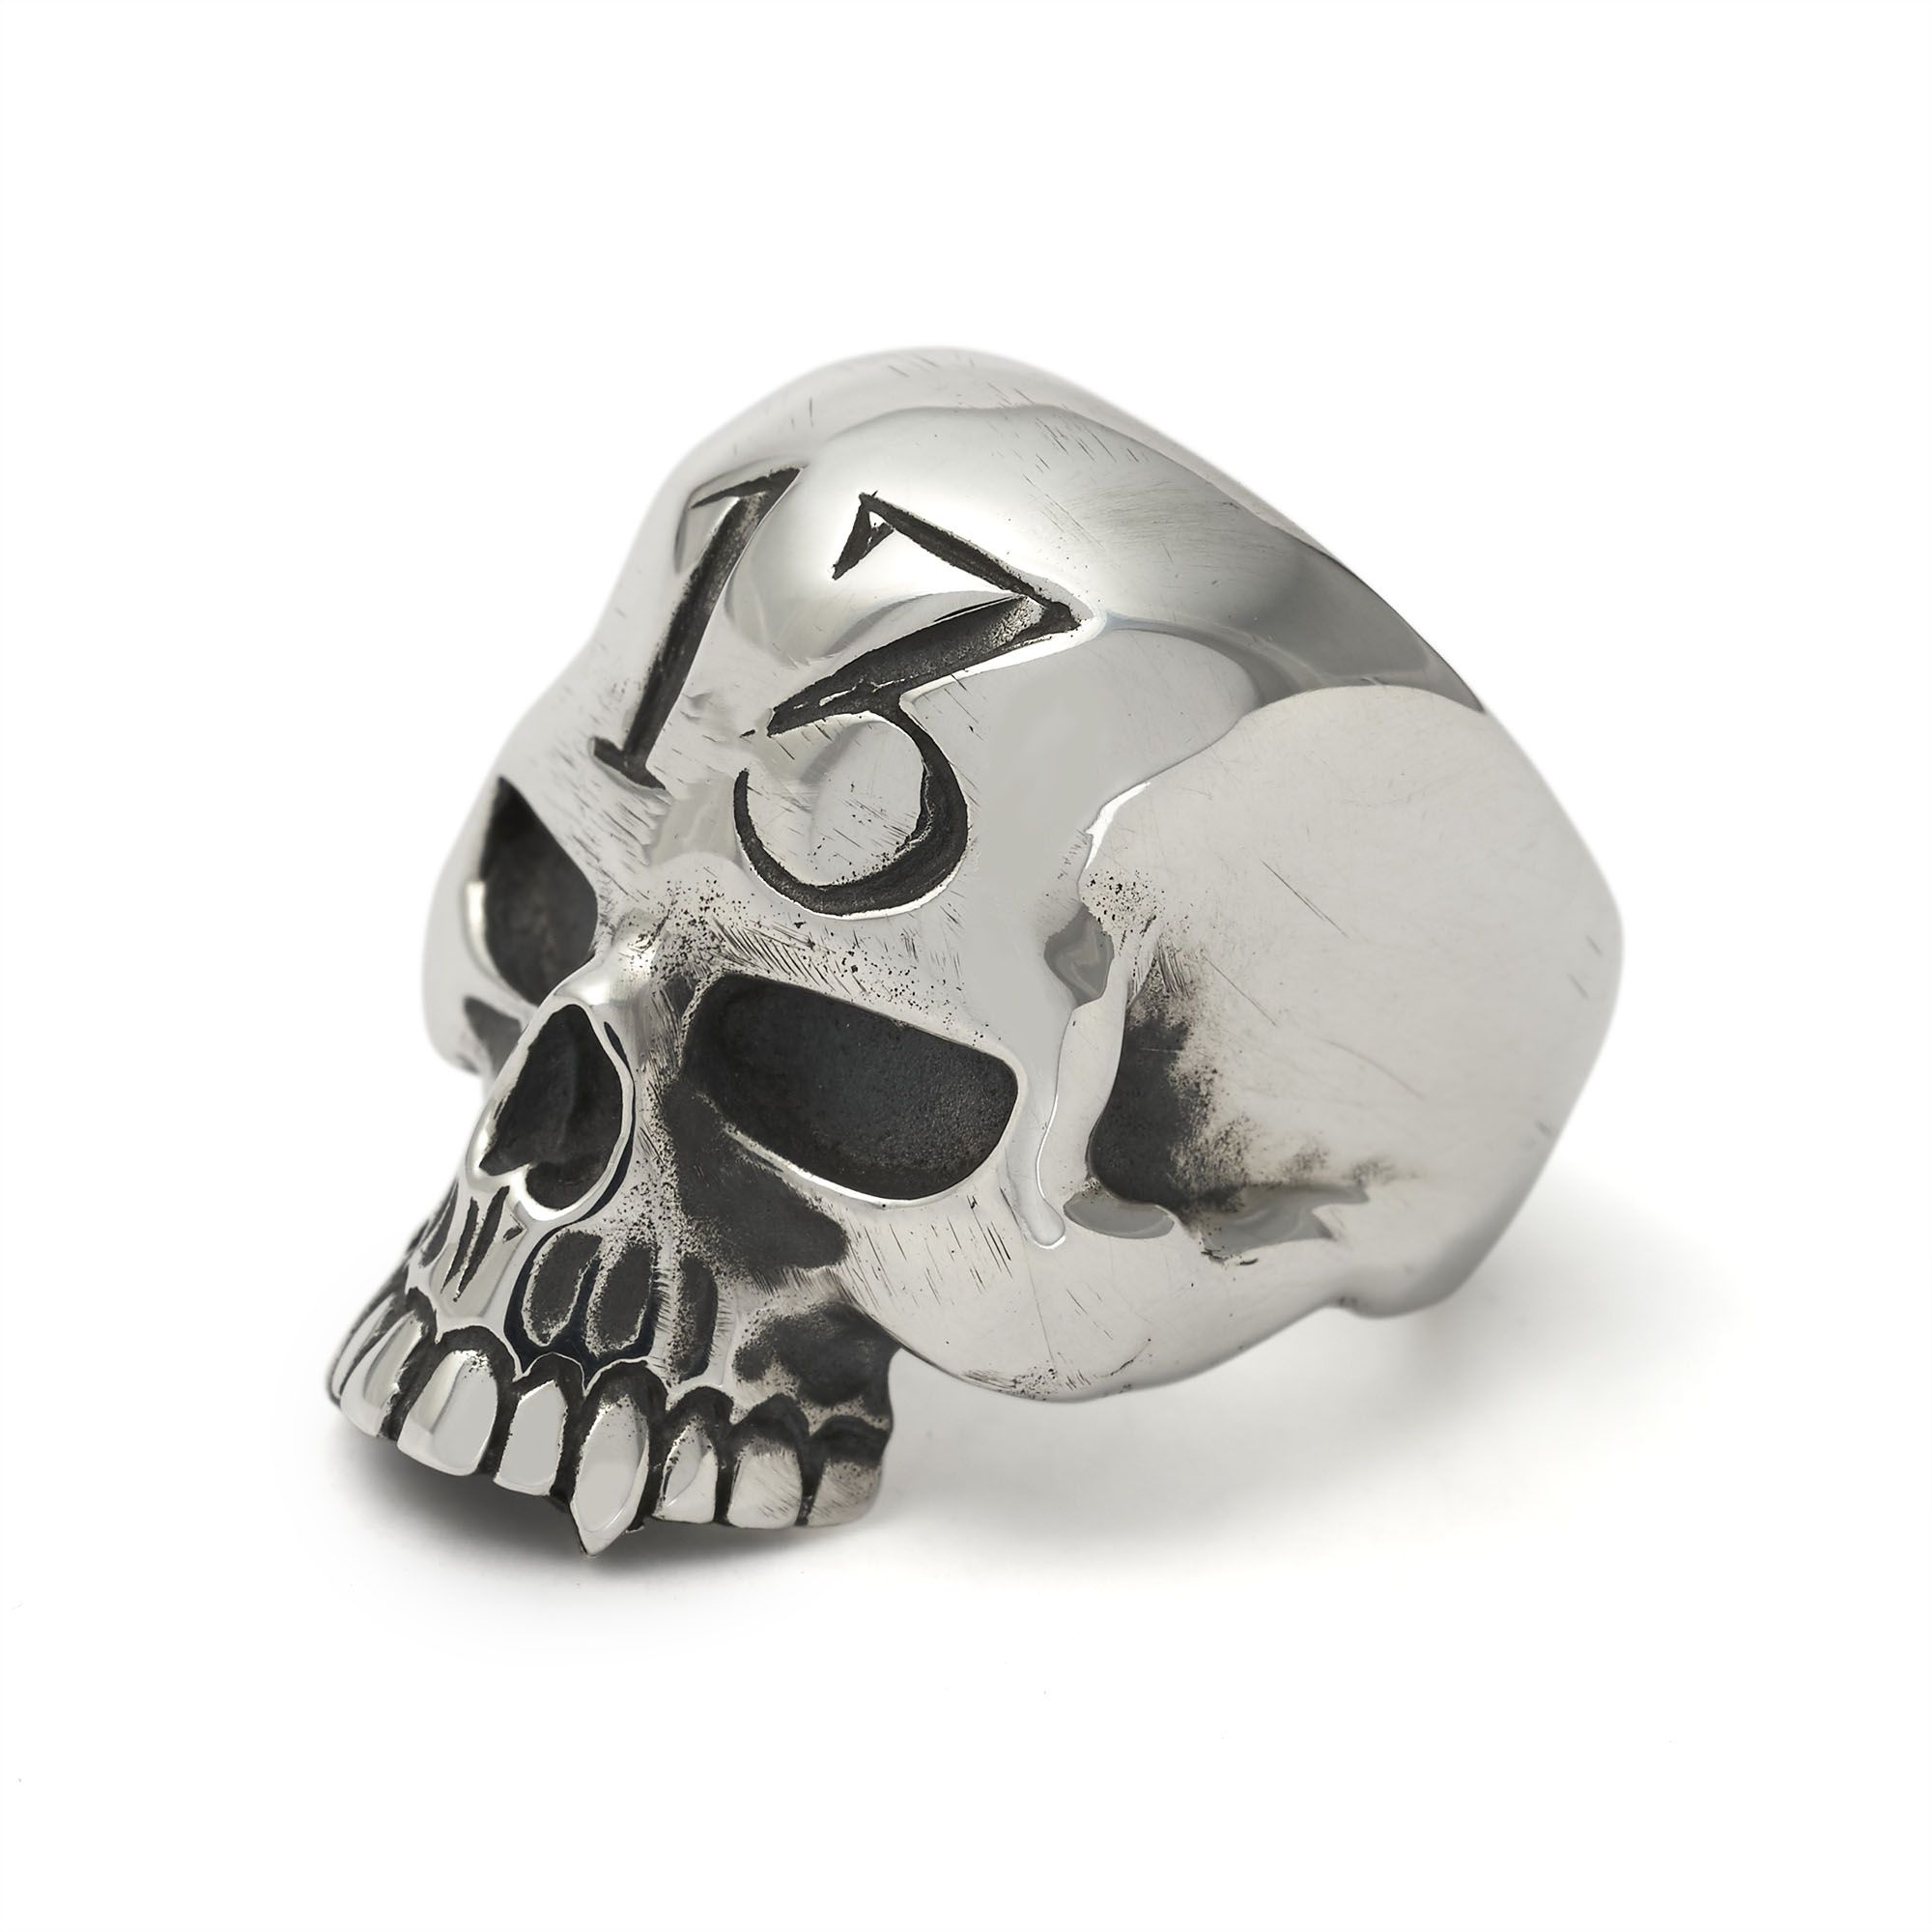 The Great Frog '13 Evil Skull' Ring Handmade In London From Hallmarked